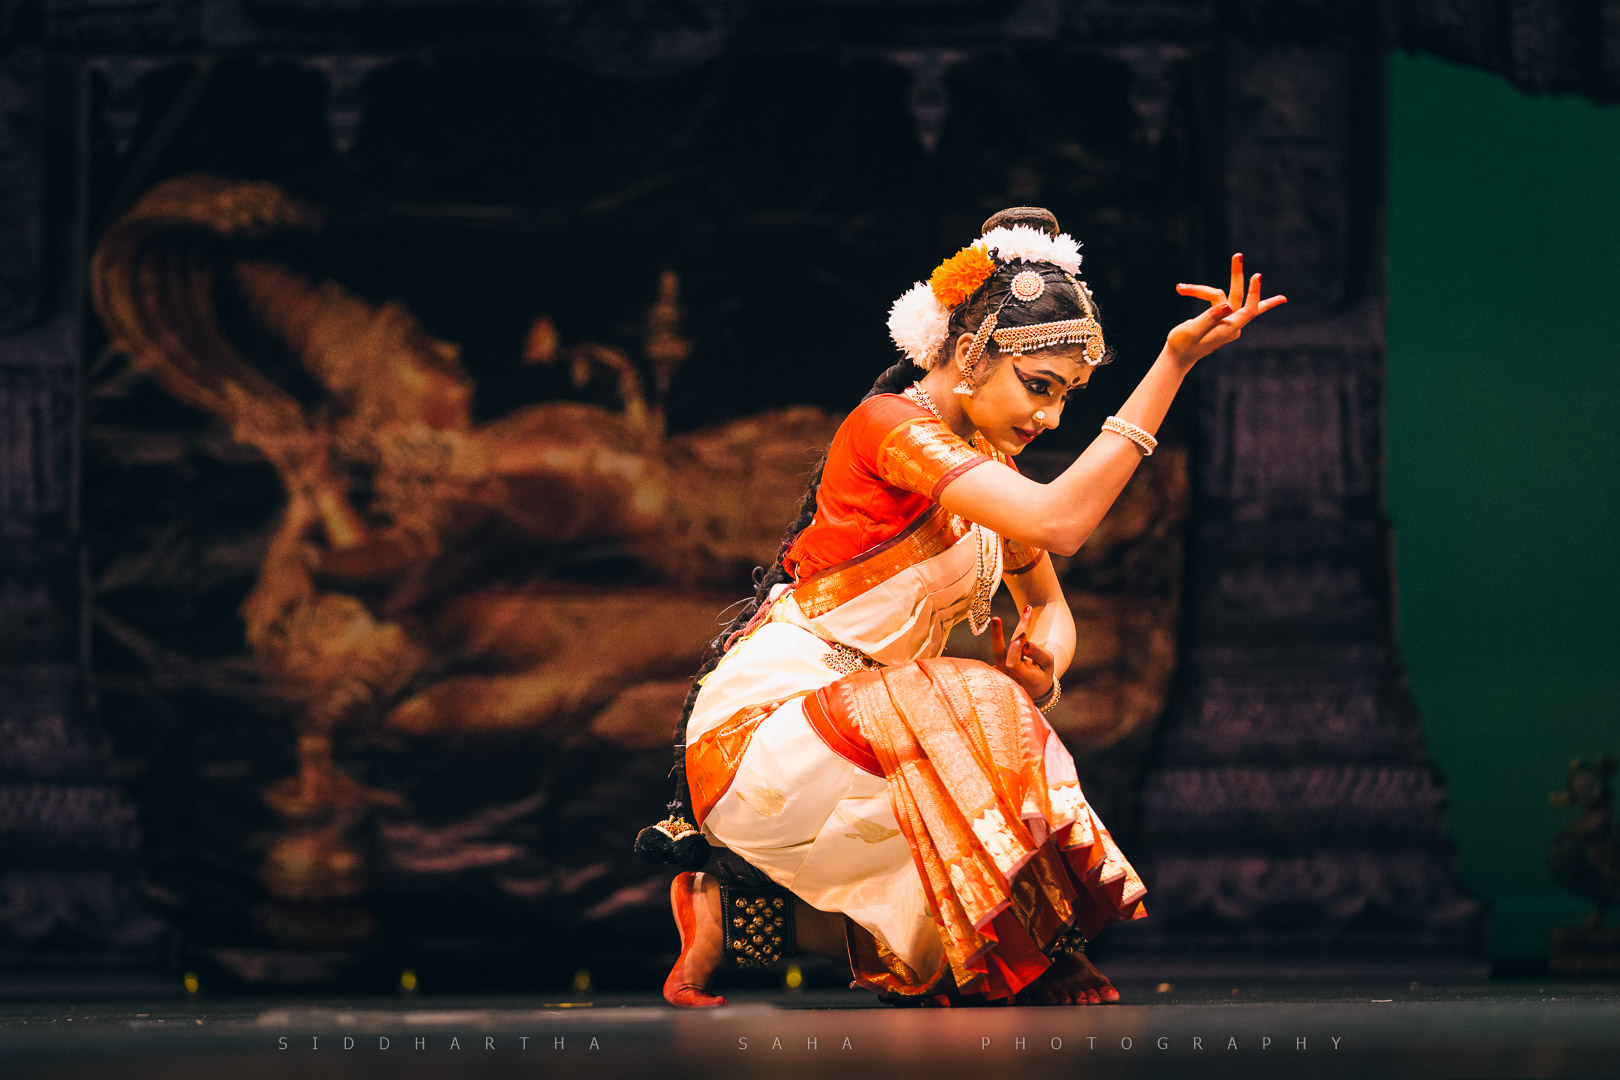 2015-07-25 - Kamaniya's Arangetram - _05Y6036